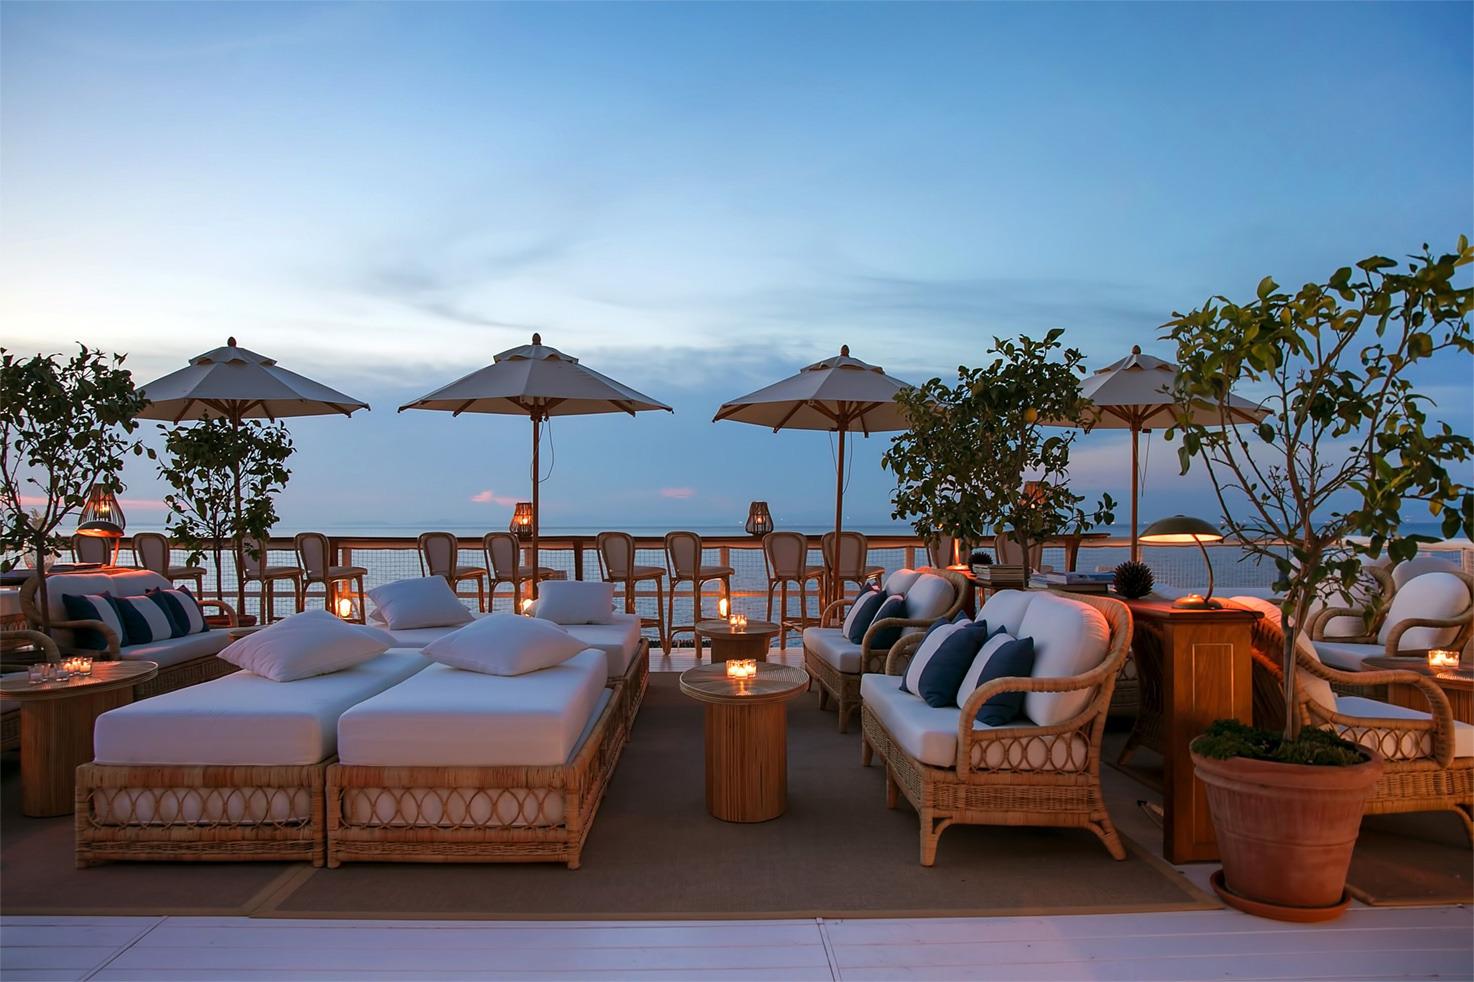 Il Riccio Terrace bar at sunset